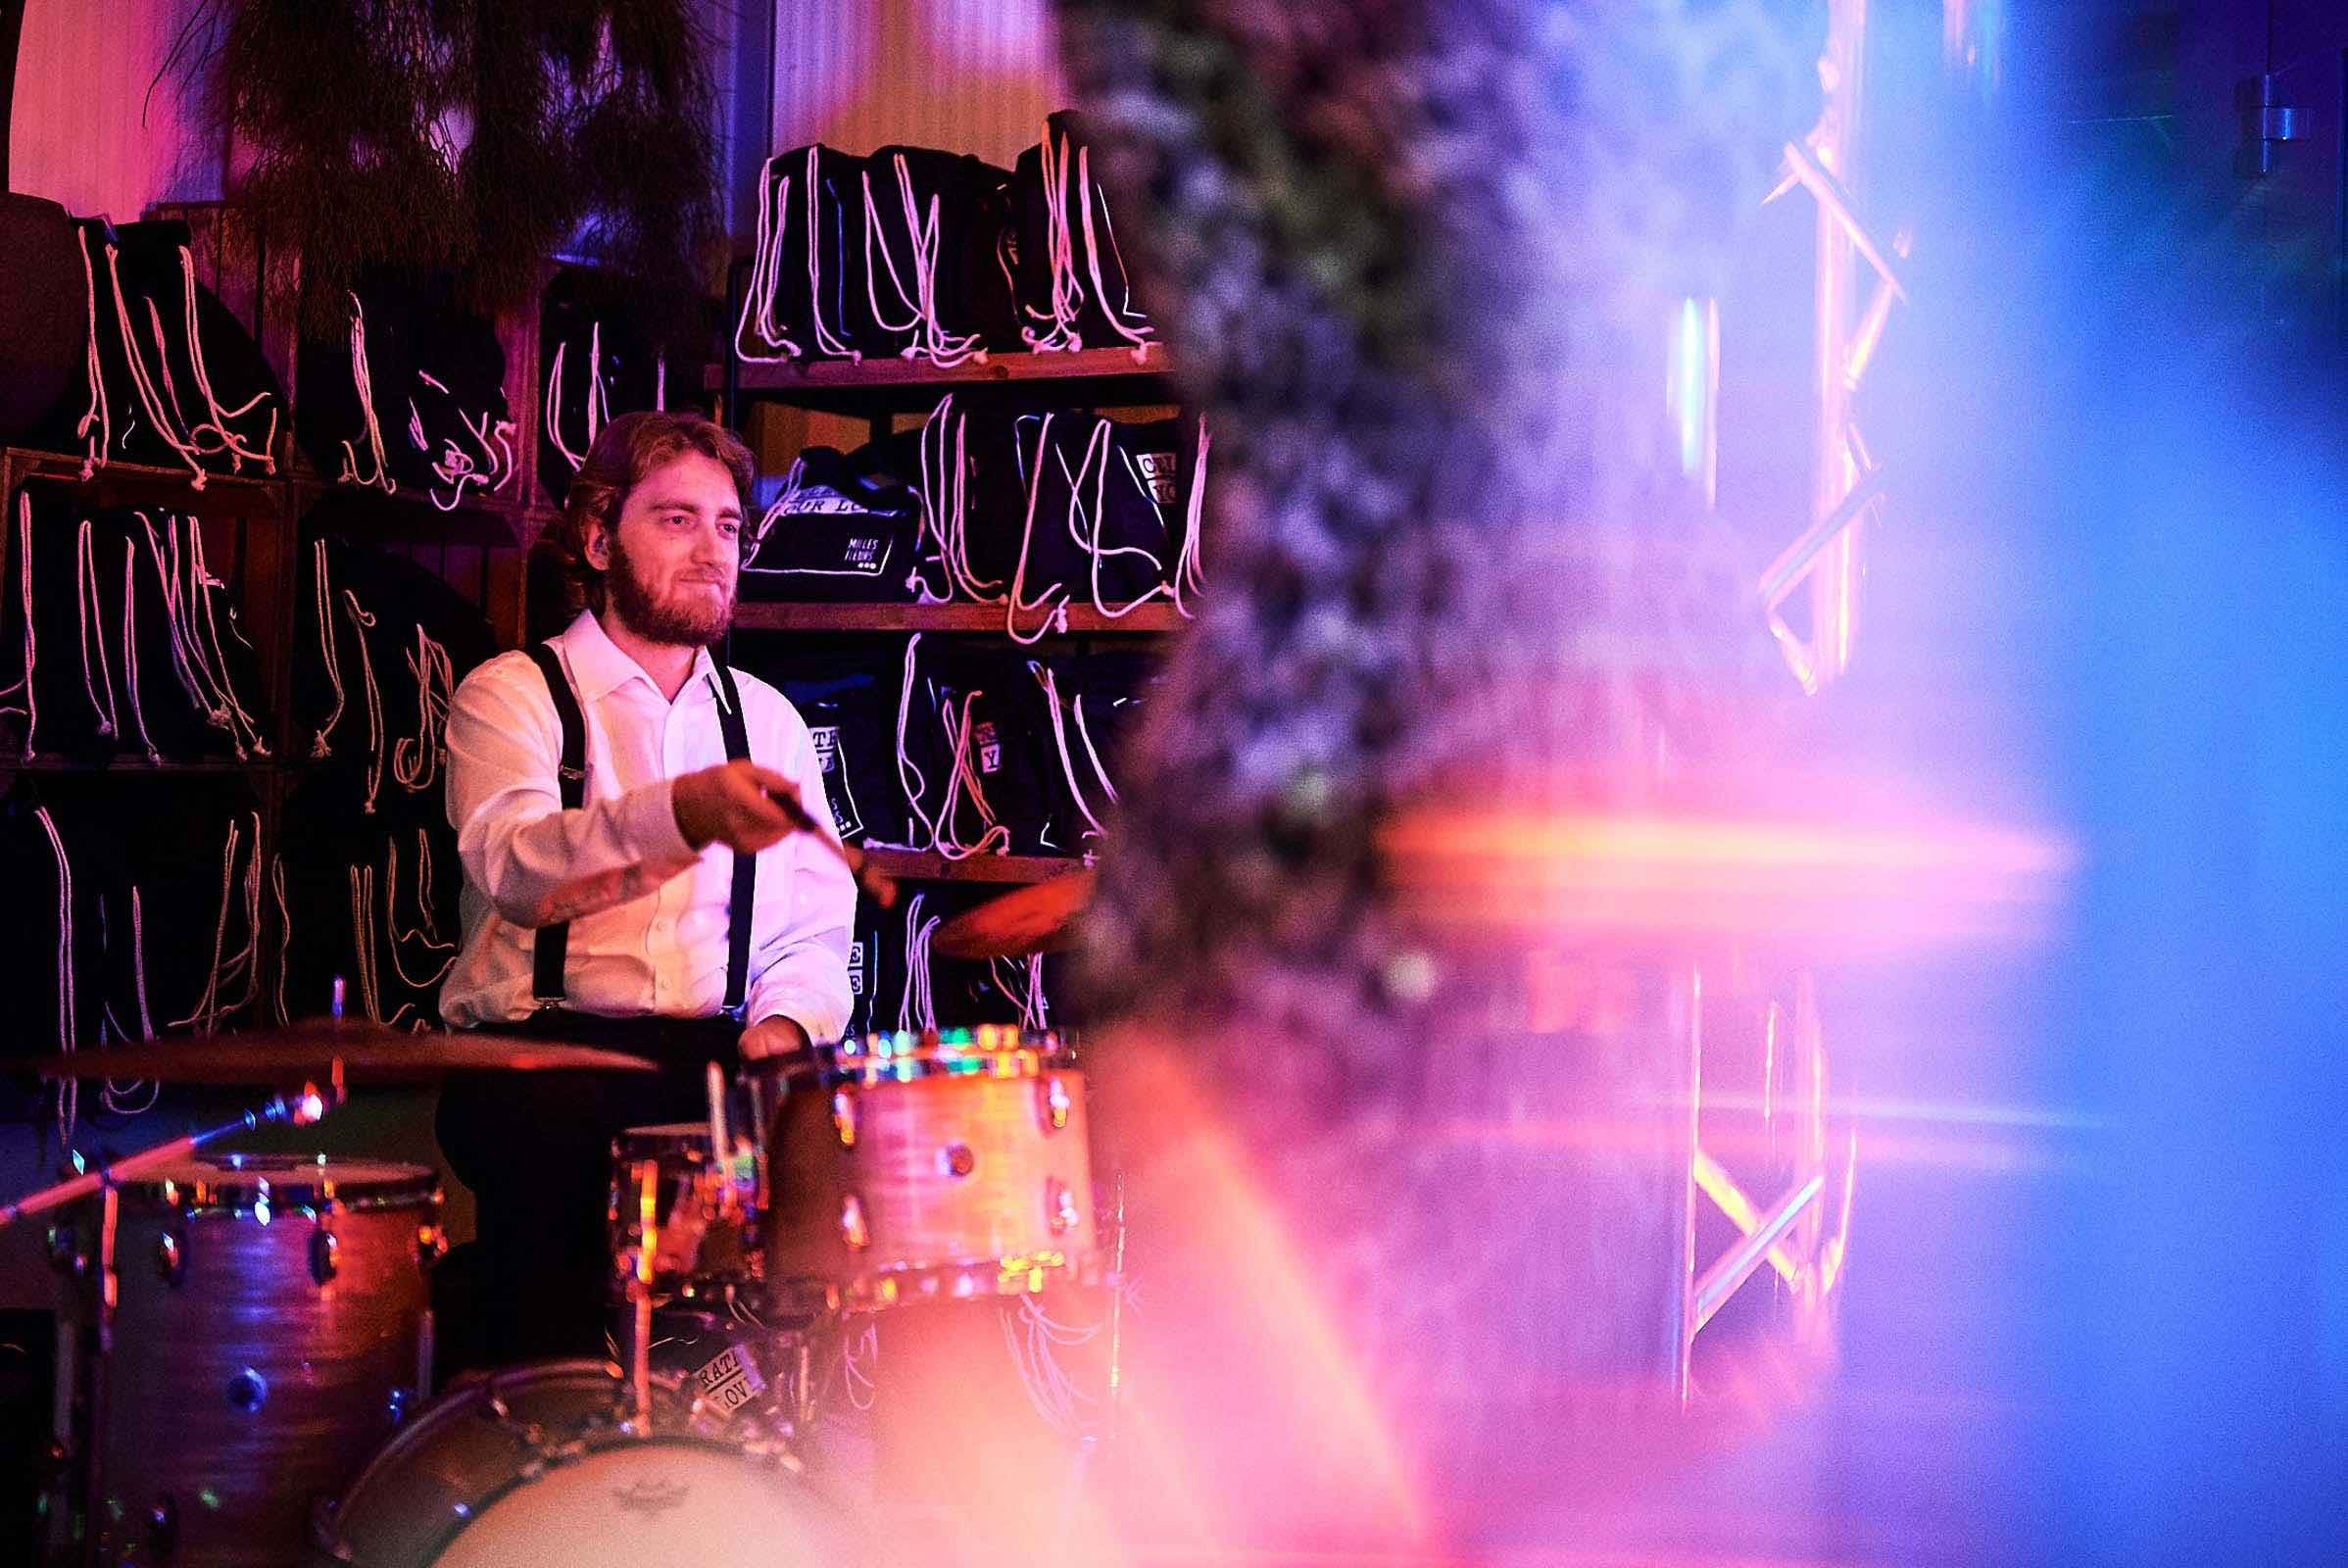 Band | Hamburg | Liveband | Livemusik | Partyband | Popband | Jazzband | Swingband | Lounge | Pop | Jazz | Soul | DJ | Saxophon | Schlagzeug | Hochzeitsband | Messe | Firmenfeier | Charity | Gala | Buchen | Mieten | Hamburgfeiert